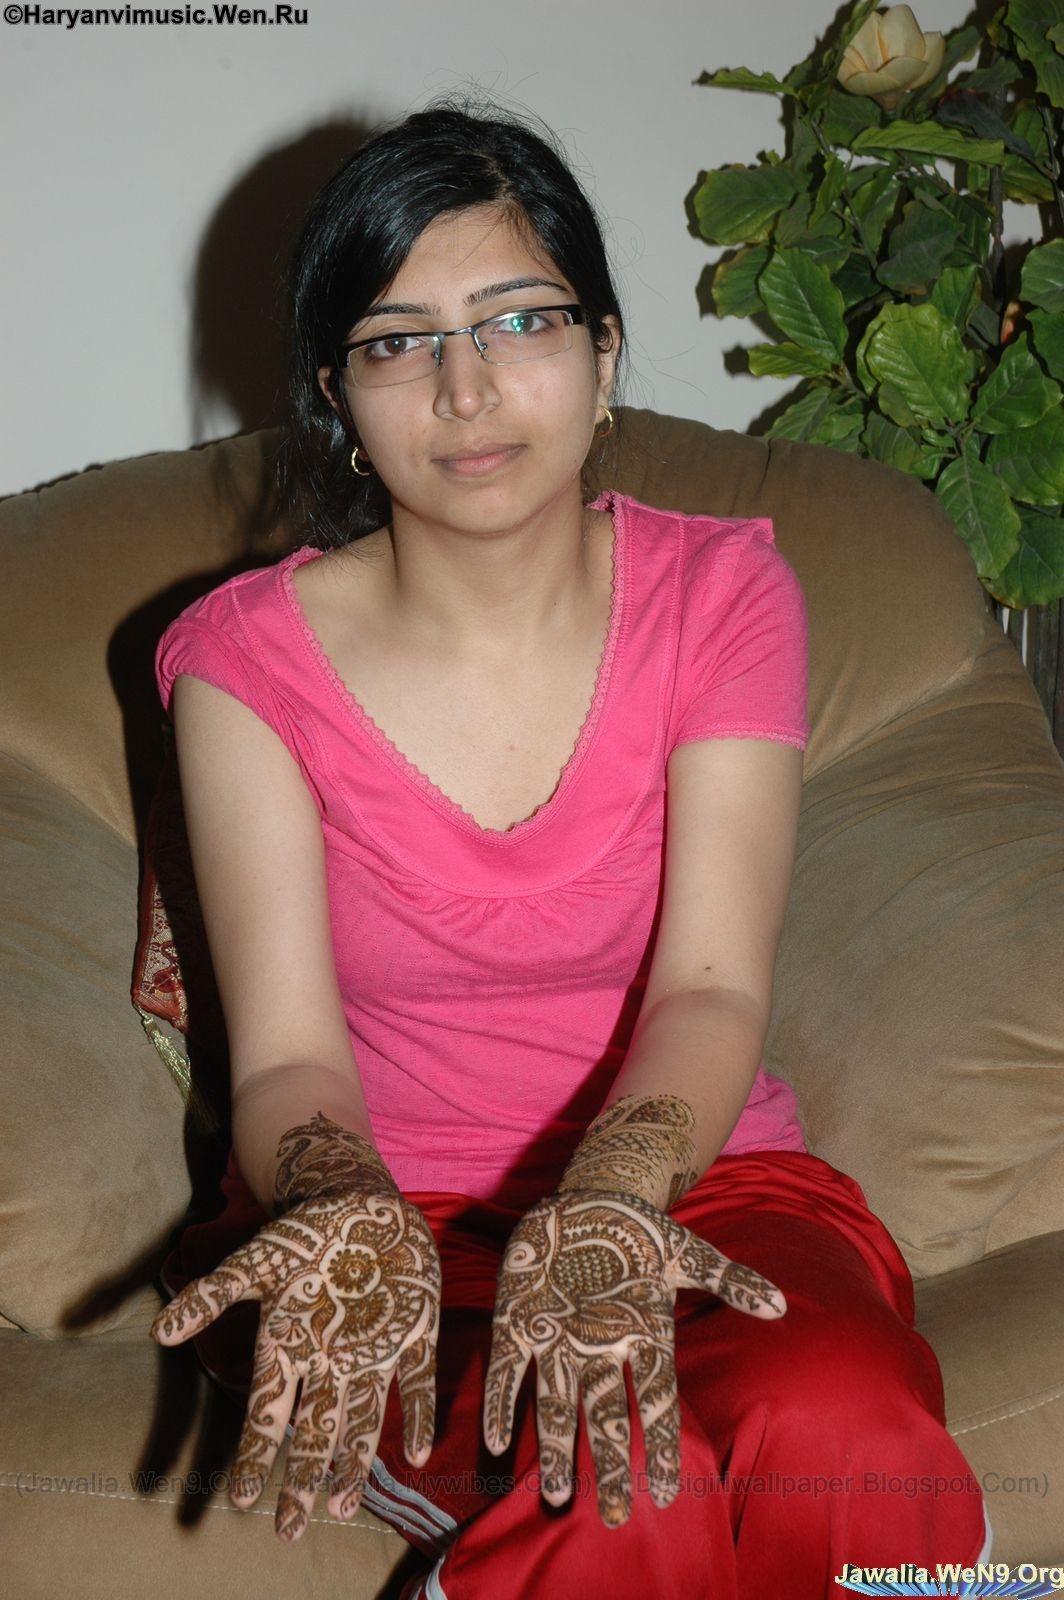 Indias No-1 Desi Girls Wallpapers Collection Village -9757